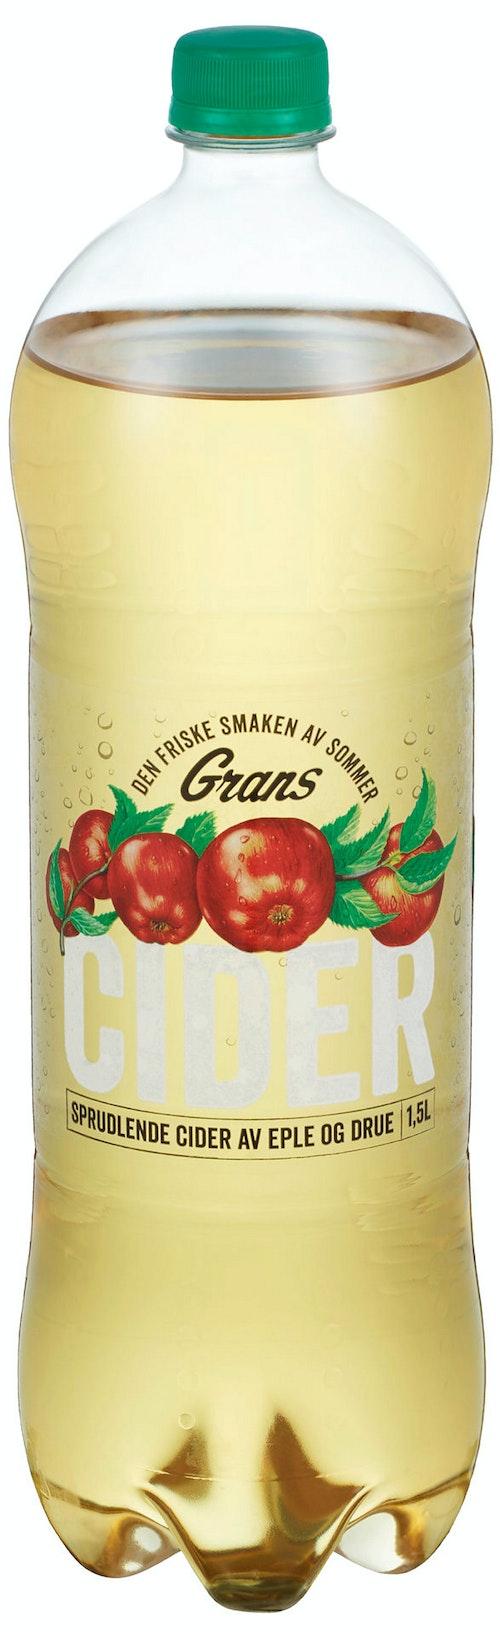 Grans Bryggeri Cider Eple & Drue 1,5 l